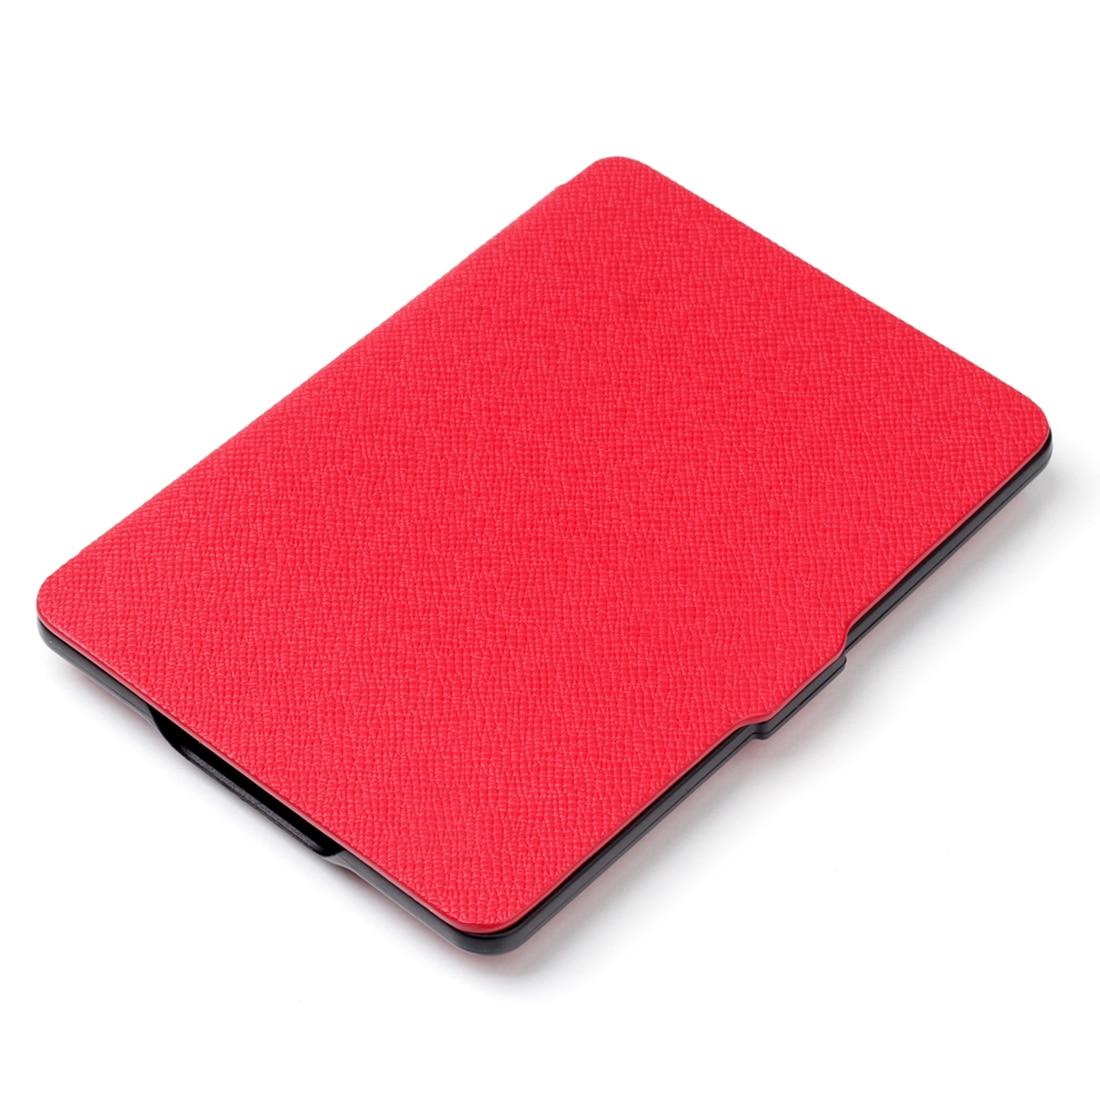 Etmakit Hot Smart Multiple Colors are Optional Ultra Slim Magnetic Case Cover For Kindle 1/2/3 generation for Kindle Paperwhite carprie motherlander case for kindle paperwhite 6inch ultra slim magnetic tablet case cover for kindle paperwhite 1 2 3 feb4